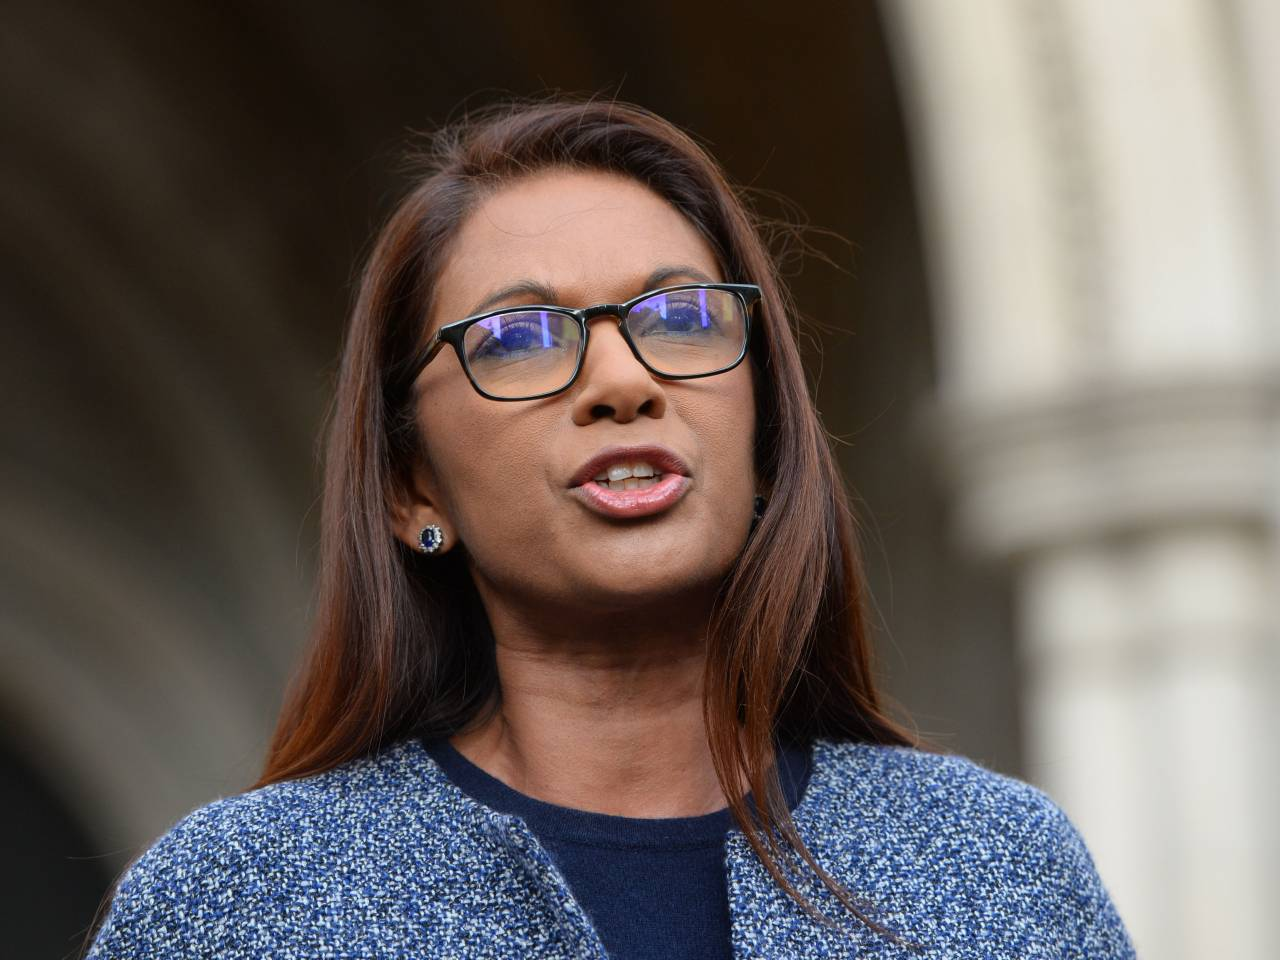 Moody's Warns of UK Downgrade If Brexit Deal Weakens Growth